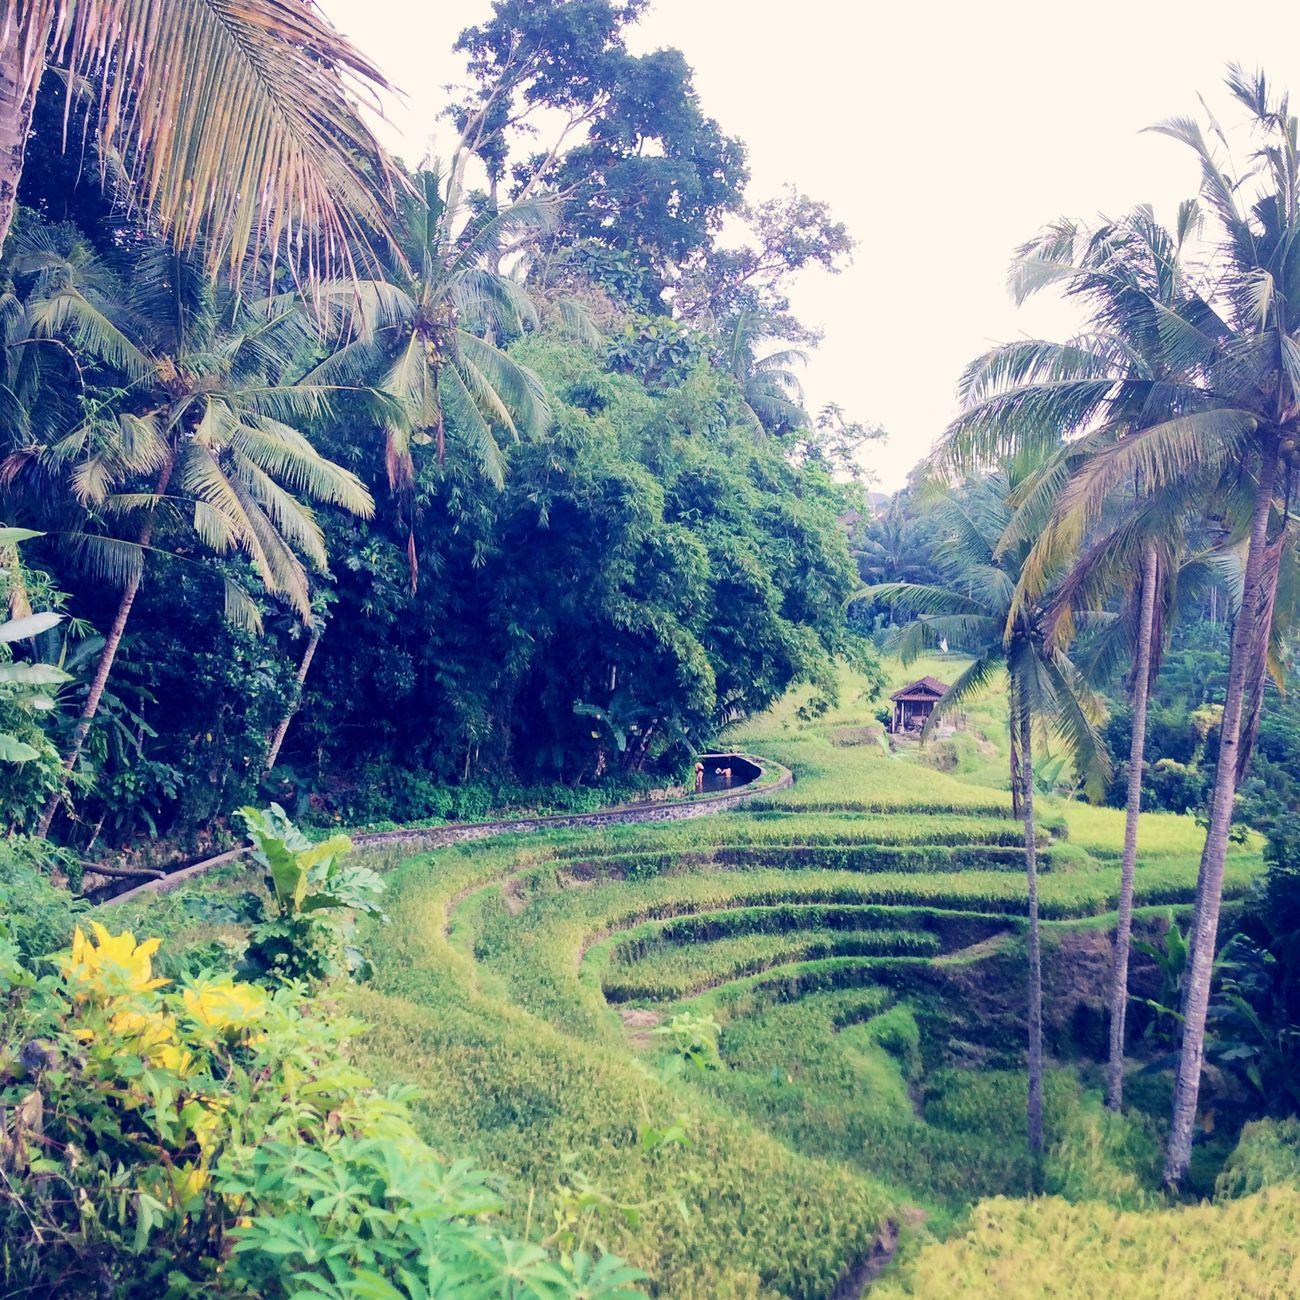 The Green Zone Ricefield Gianyar Bali